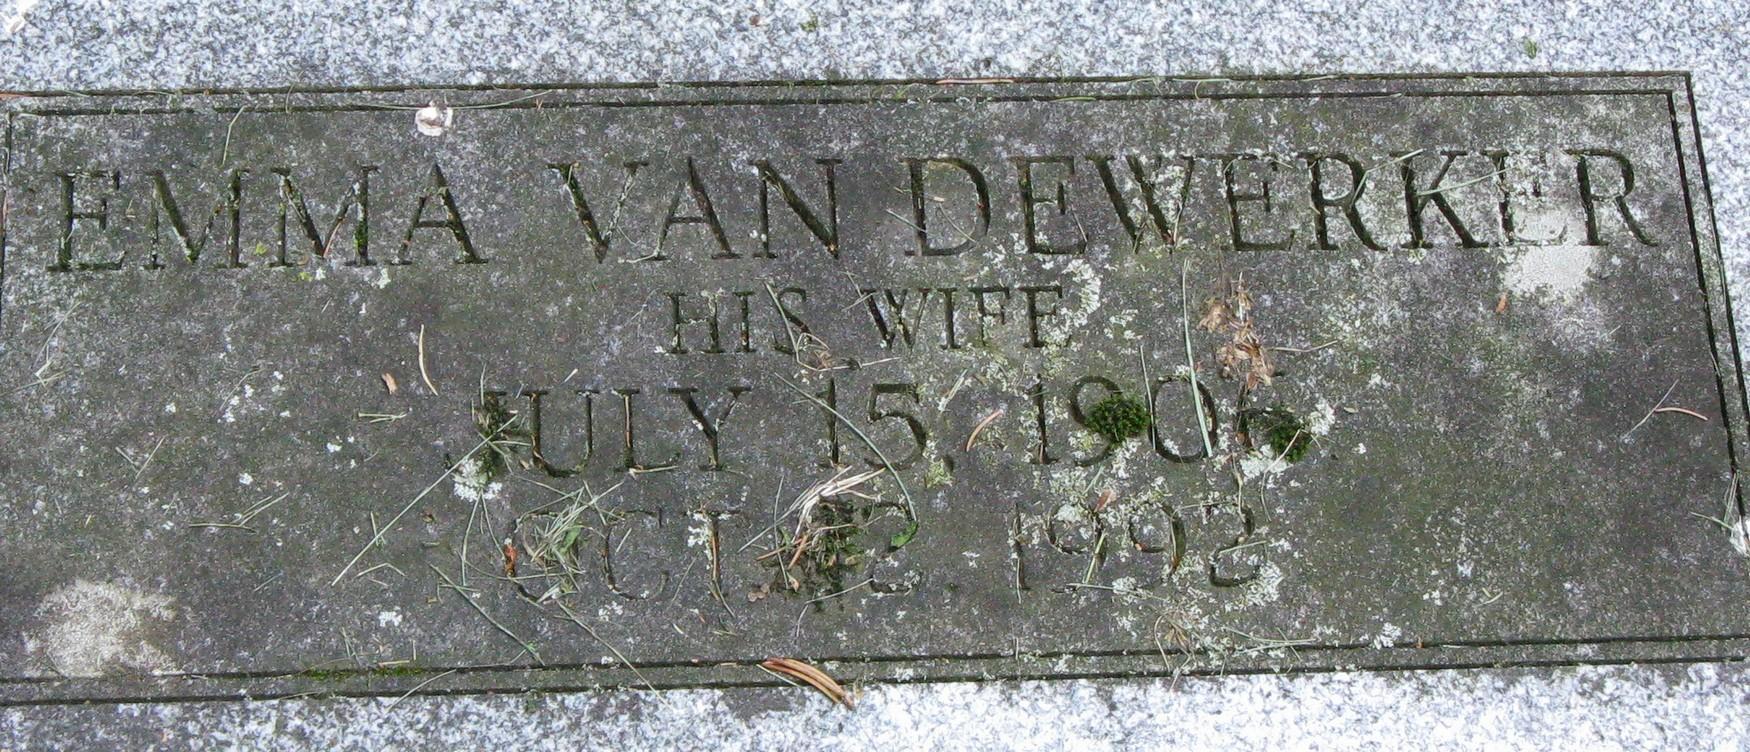 Emma <i>Van Dewerker</i> Fonda